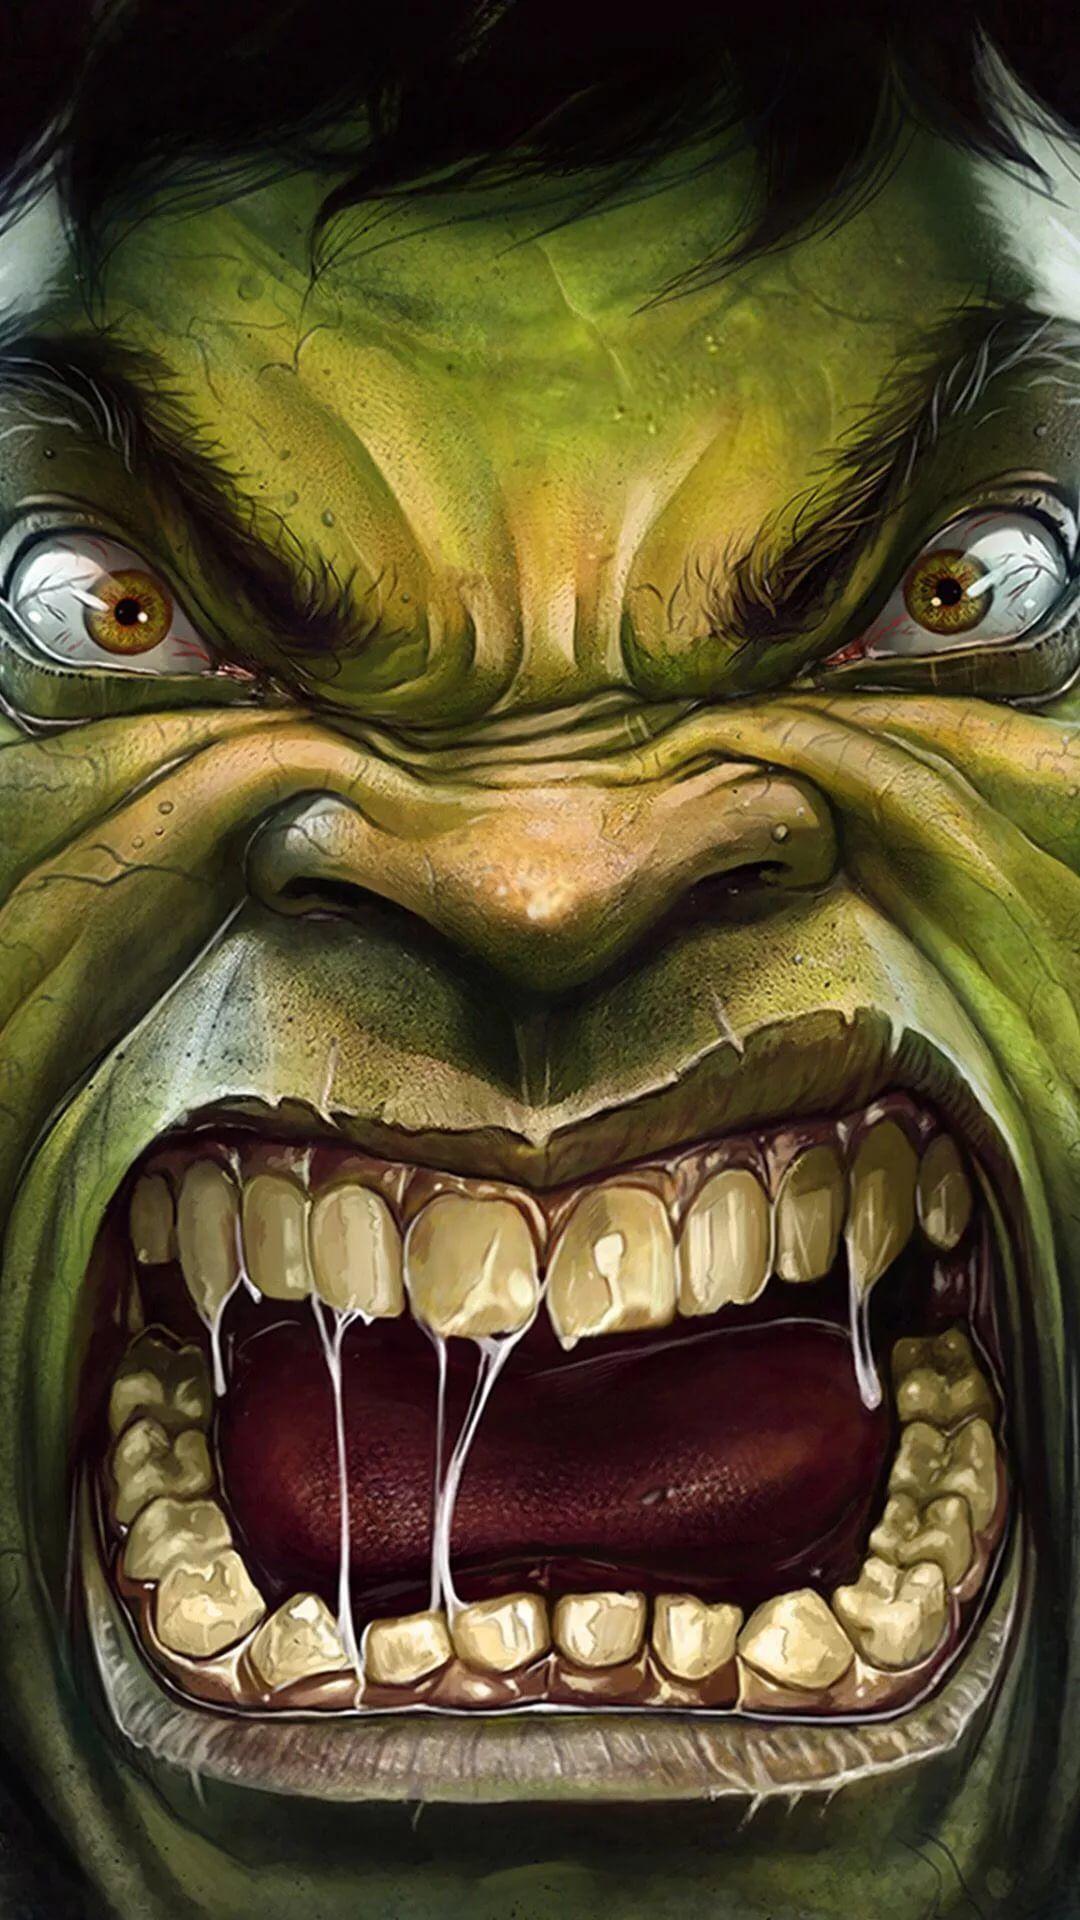 Hulk D iPhone 7 wallpaper hd